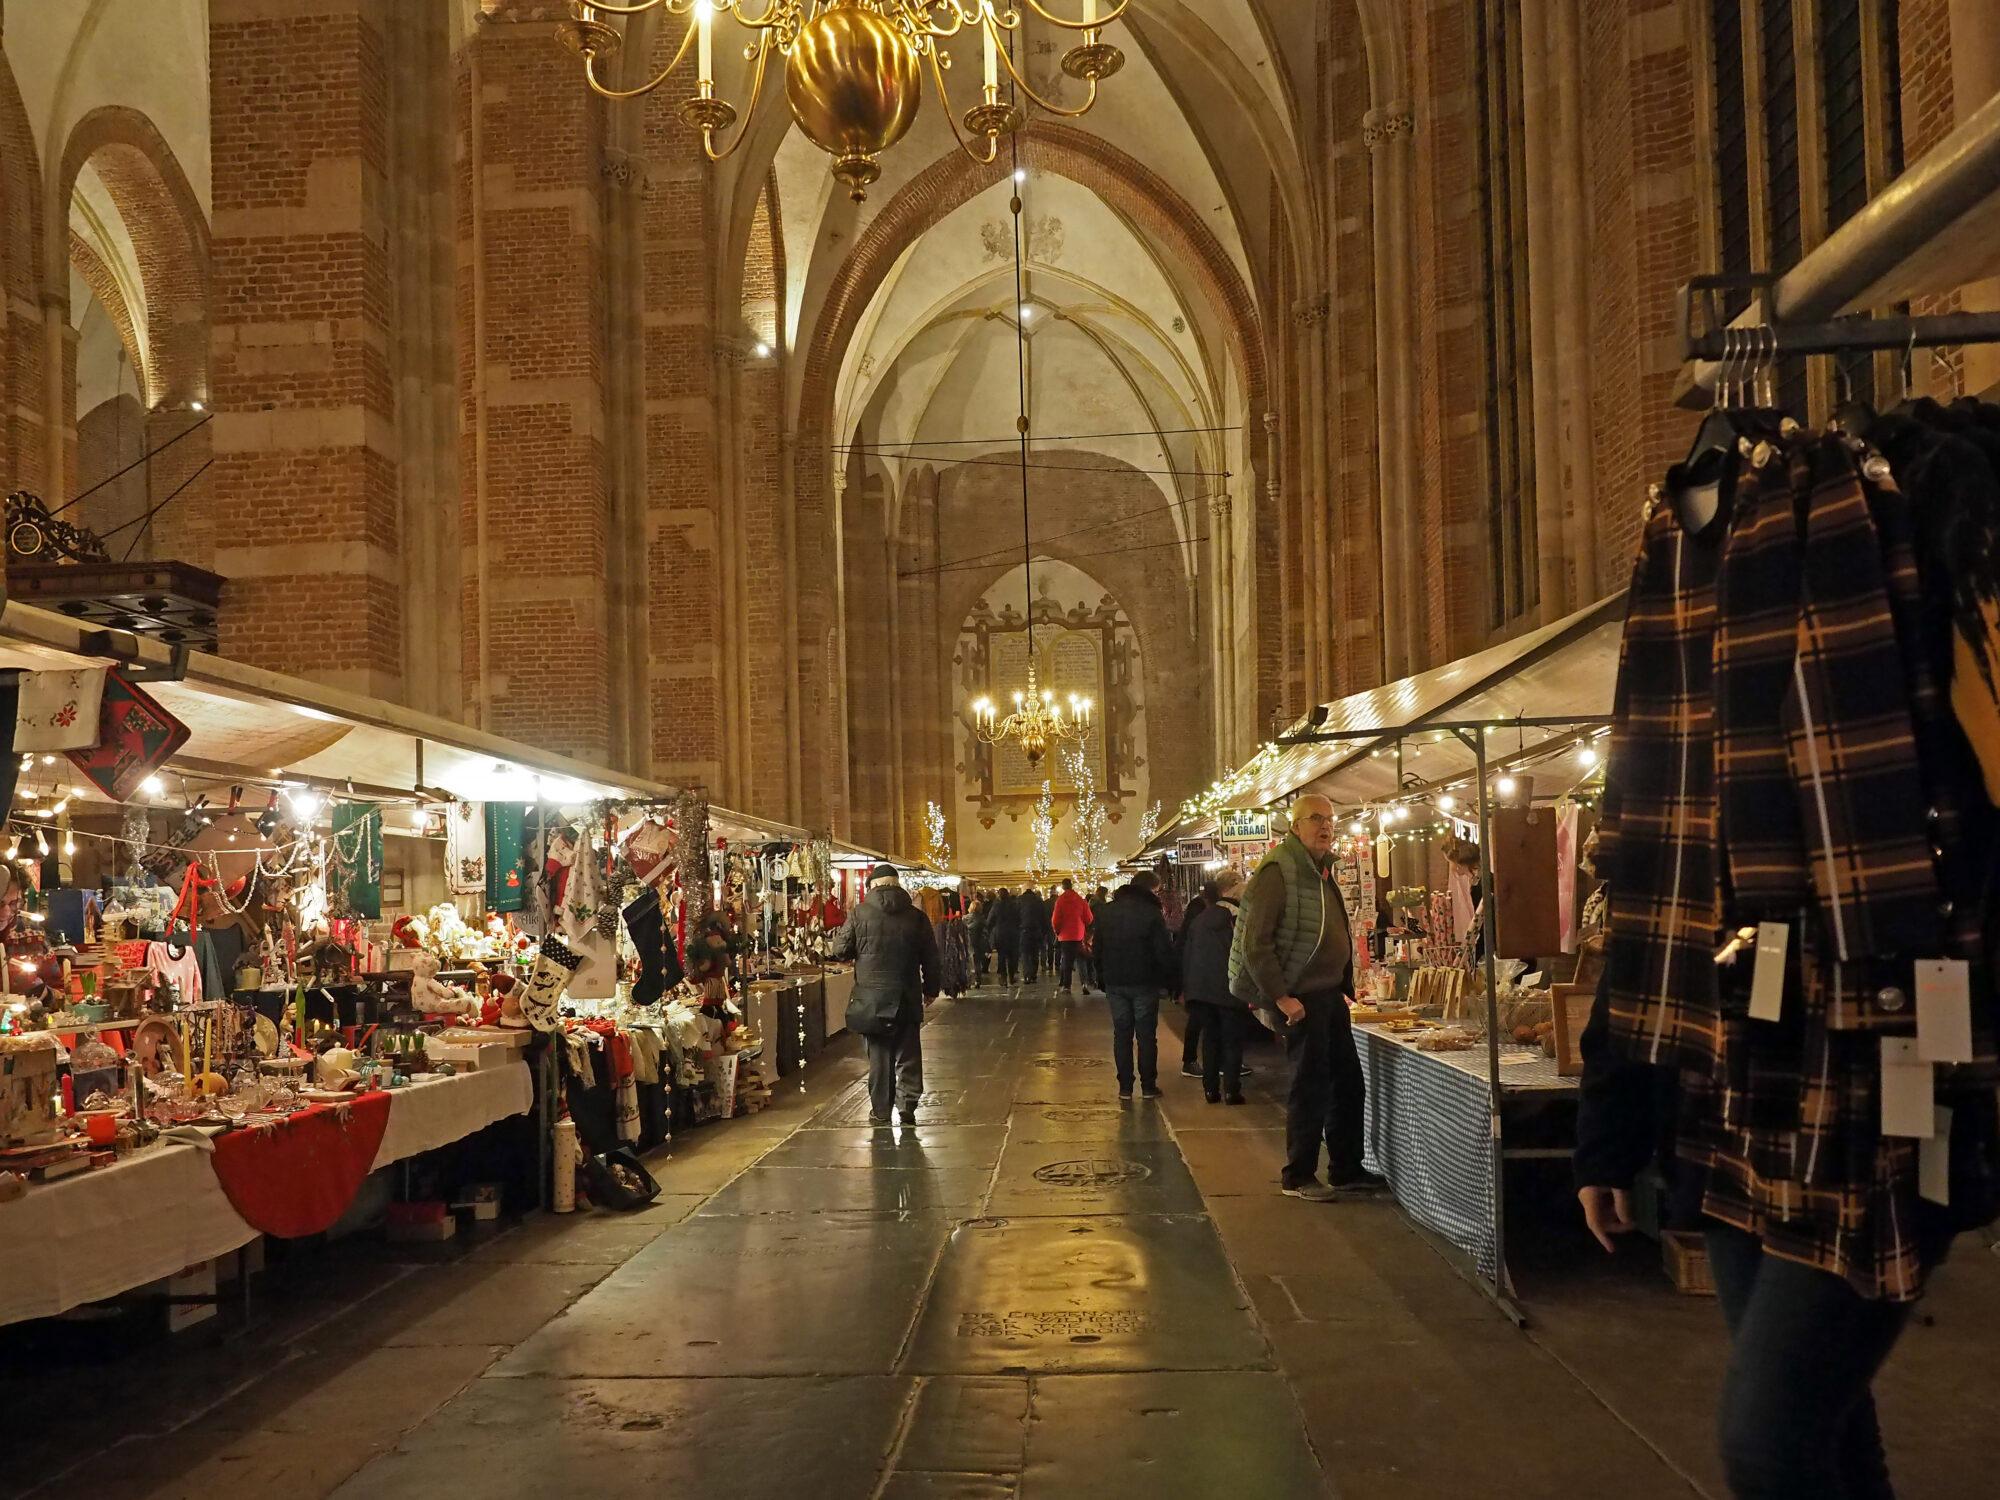 Sfeervolle kerstmarkt in kerk